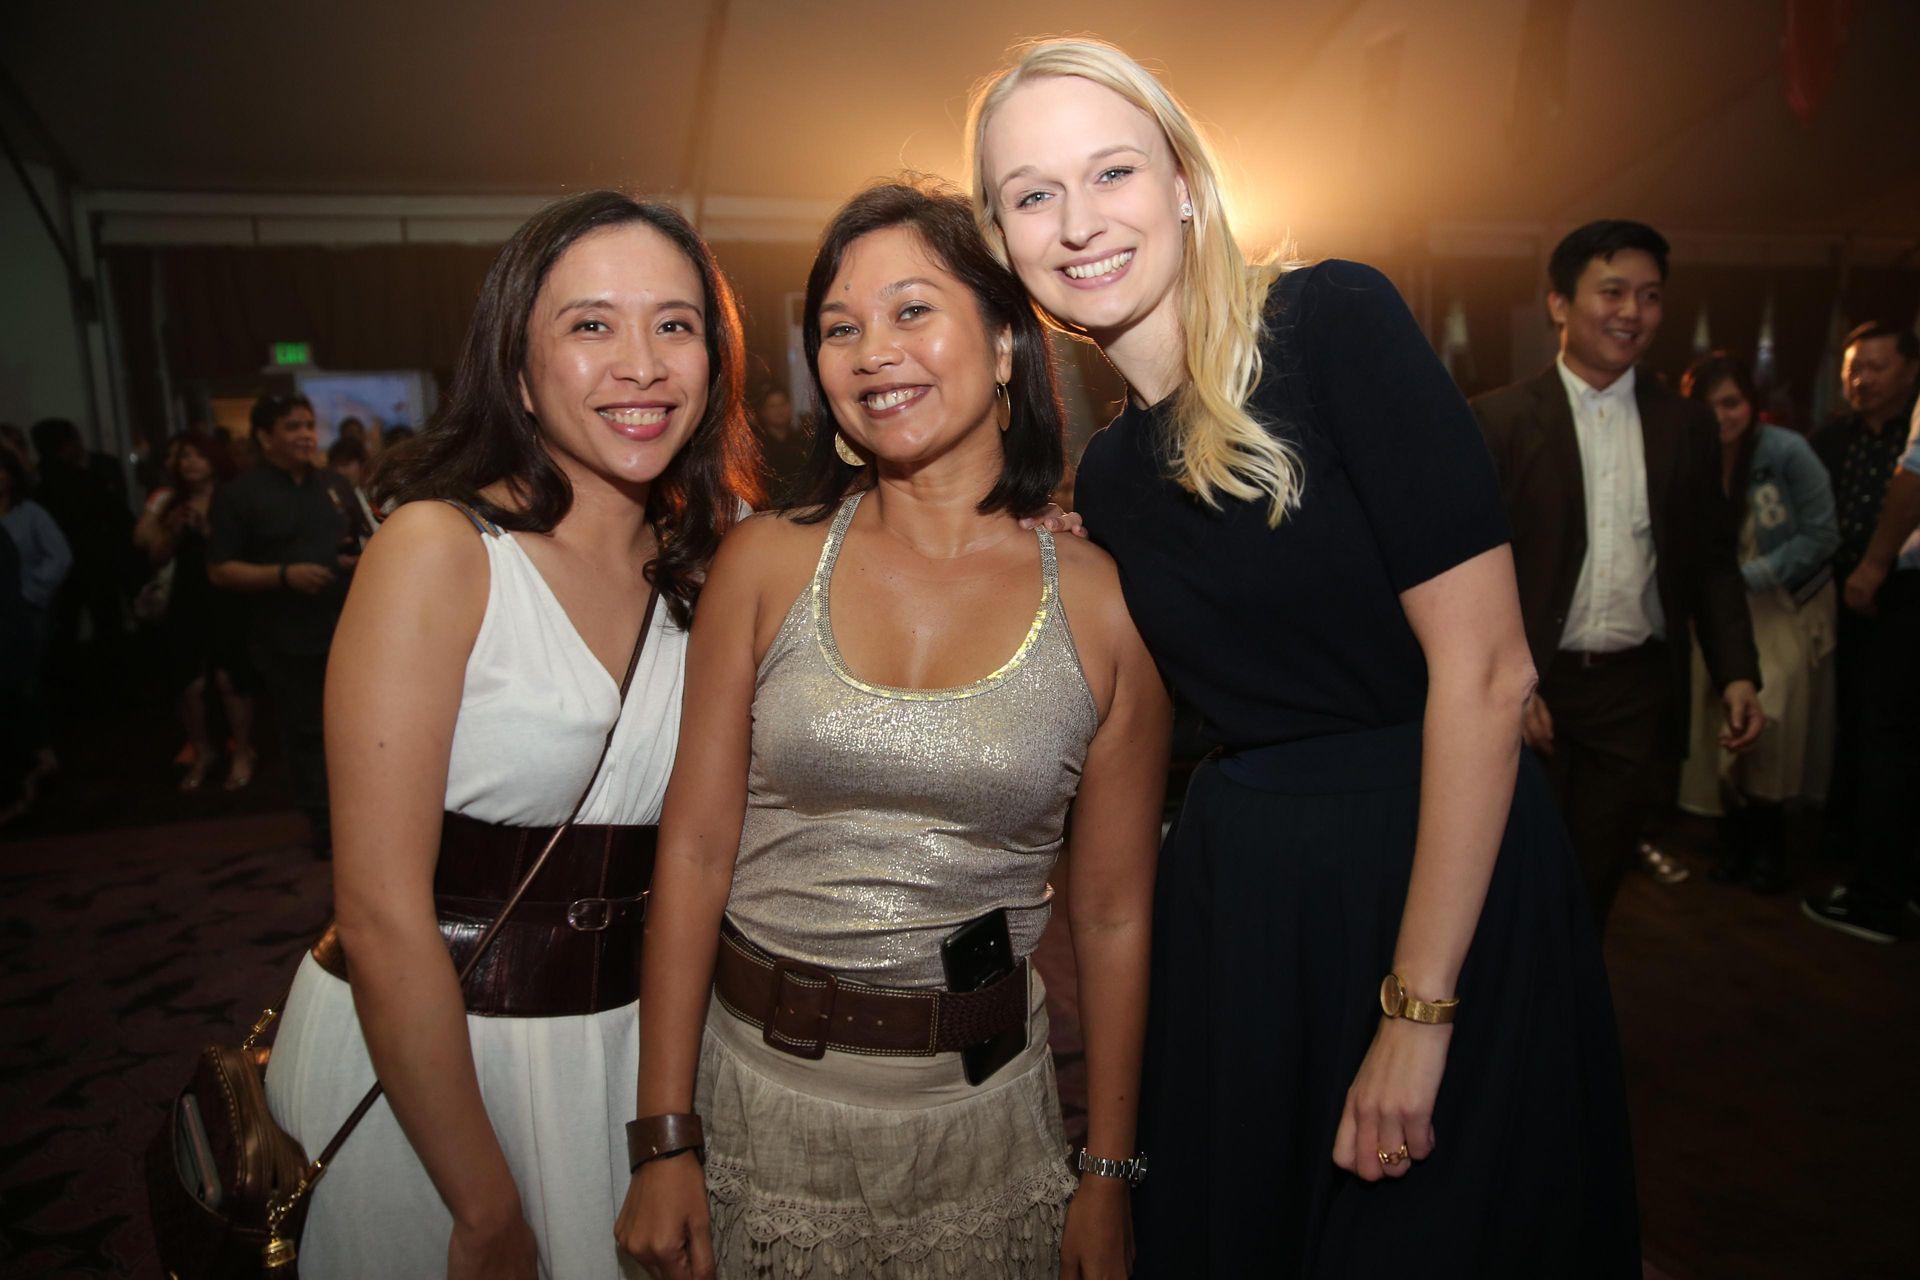 Christina Cuyco, Shiela Paul and NNIT's Karina Juhl Kristiansen